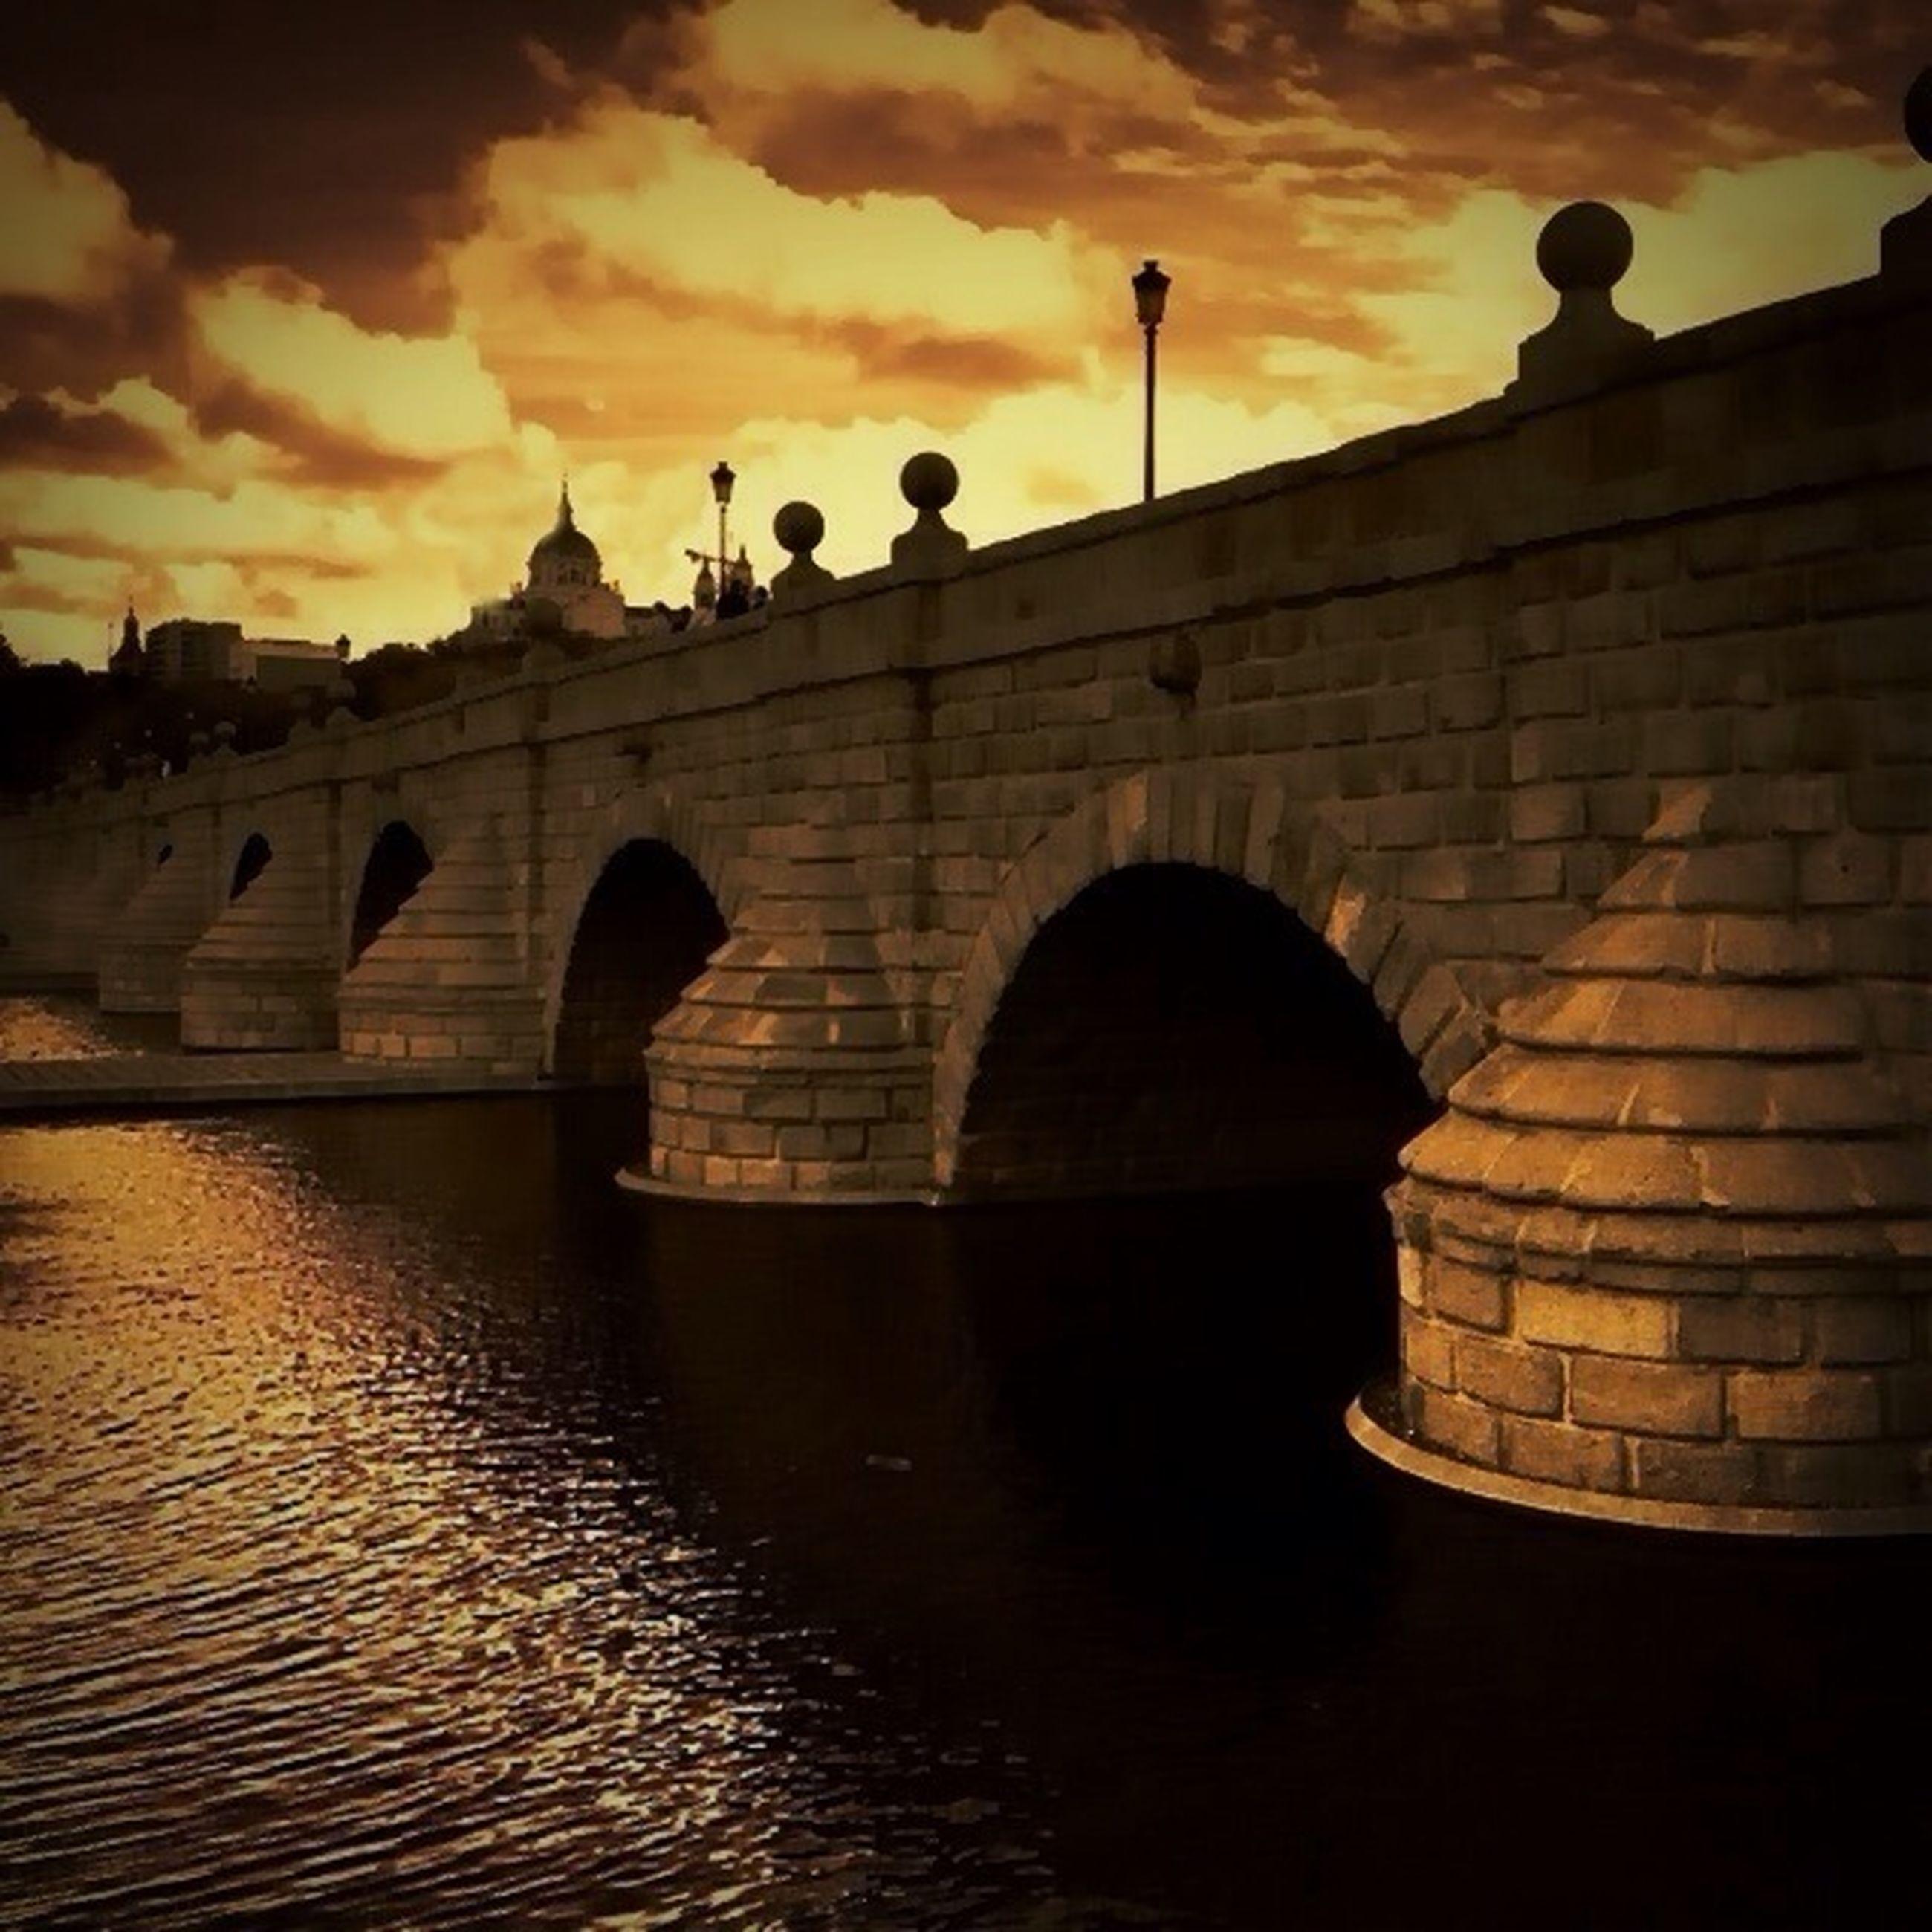 architecture, built structure, sunset, arch, sky, water, building exterior, connection, waterfront, bridge - man made structure, river, reflection, arch bridge, silhouette, cloud - sky, bridge, outdoors, orange color, dusk, no people